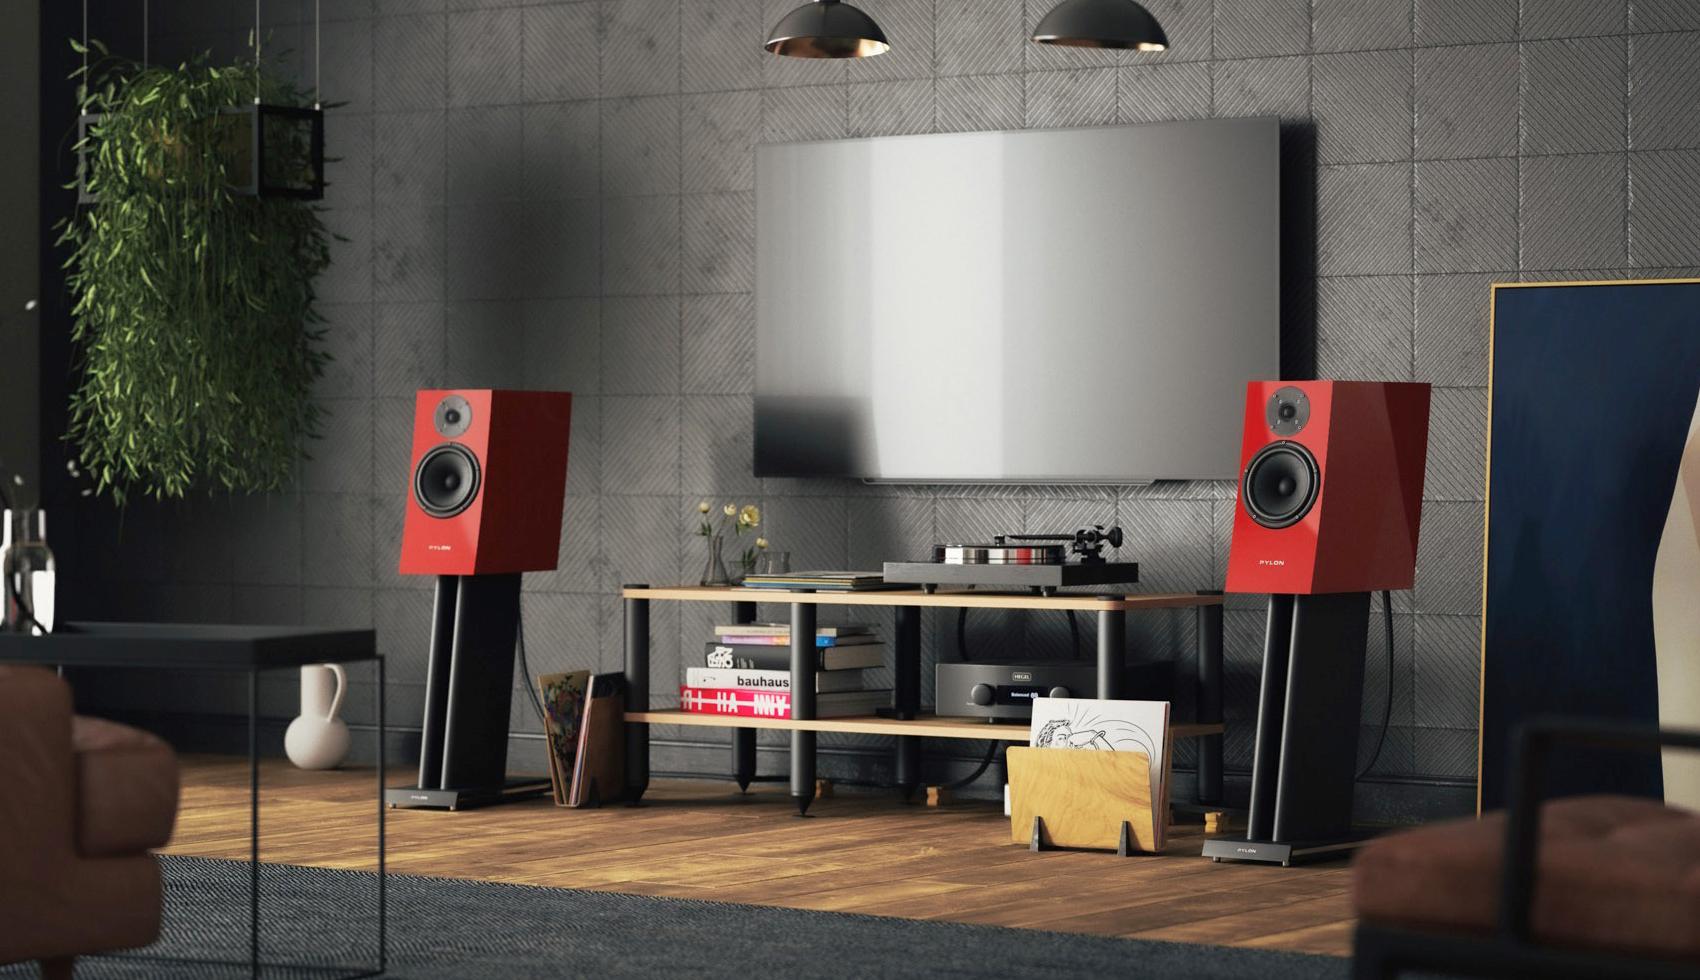 pylon_audio_jasper_monitor_18_speakers_review_matej_isak_mono_and_stereo_2021_2022_2023_-1.jpg